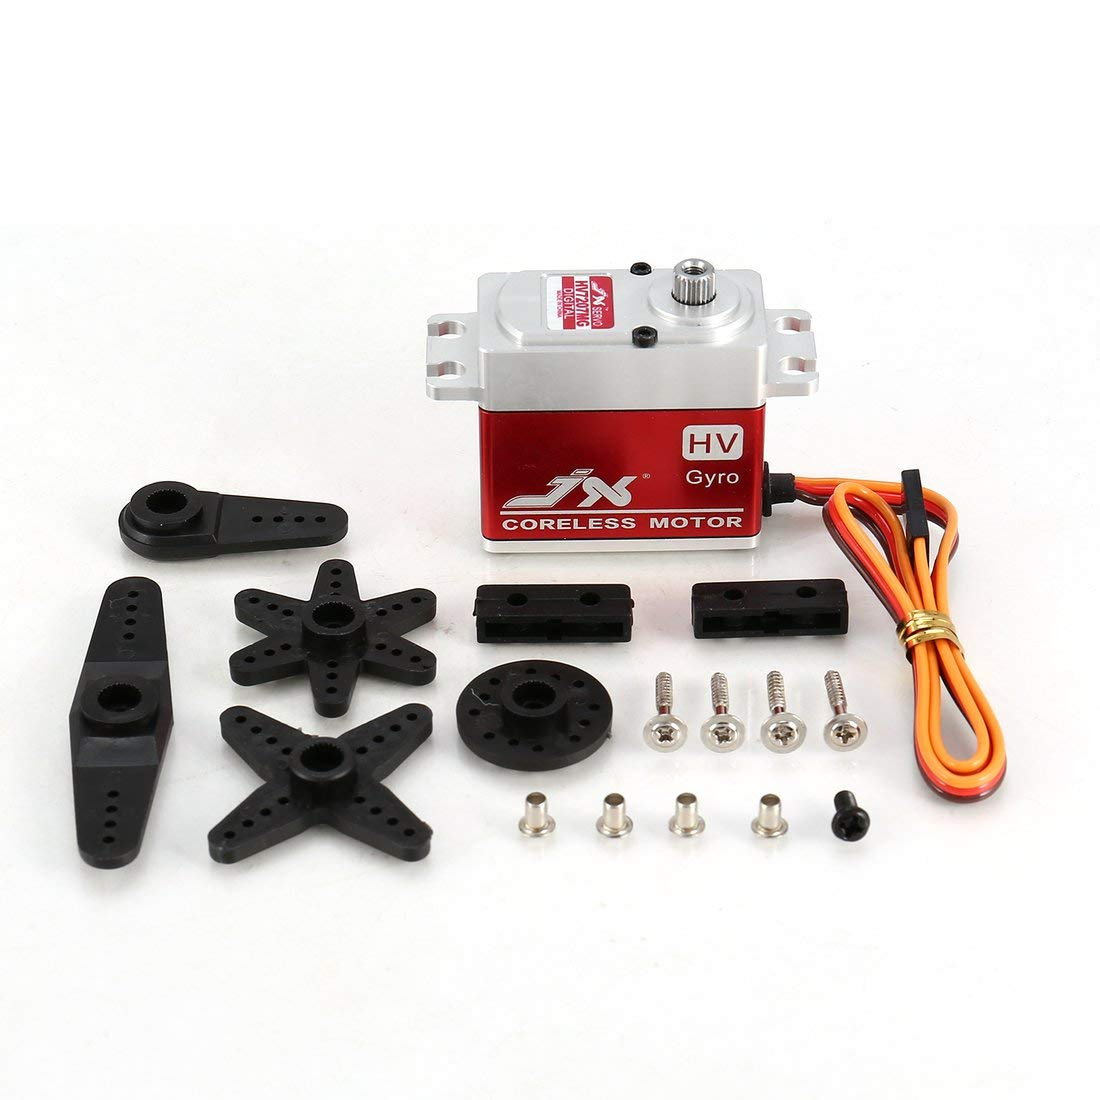 JX PDI-HV7207MG 7KG CNC Metalllenkung Digital Metal Gear Coreless Servo mit HV High Torque Spannung für RC Car Robot Drone - Silber & Rot